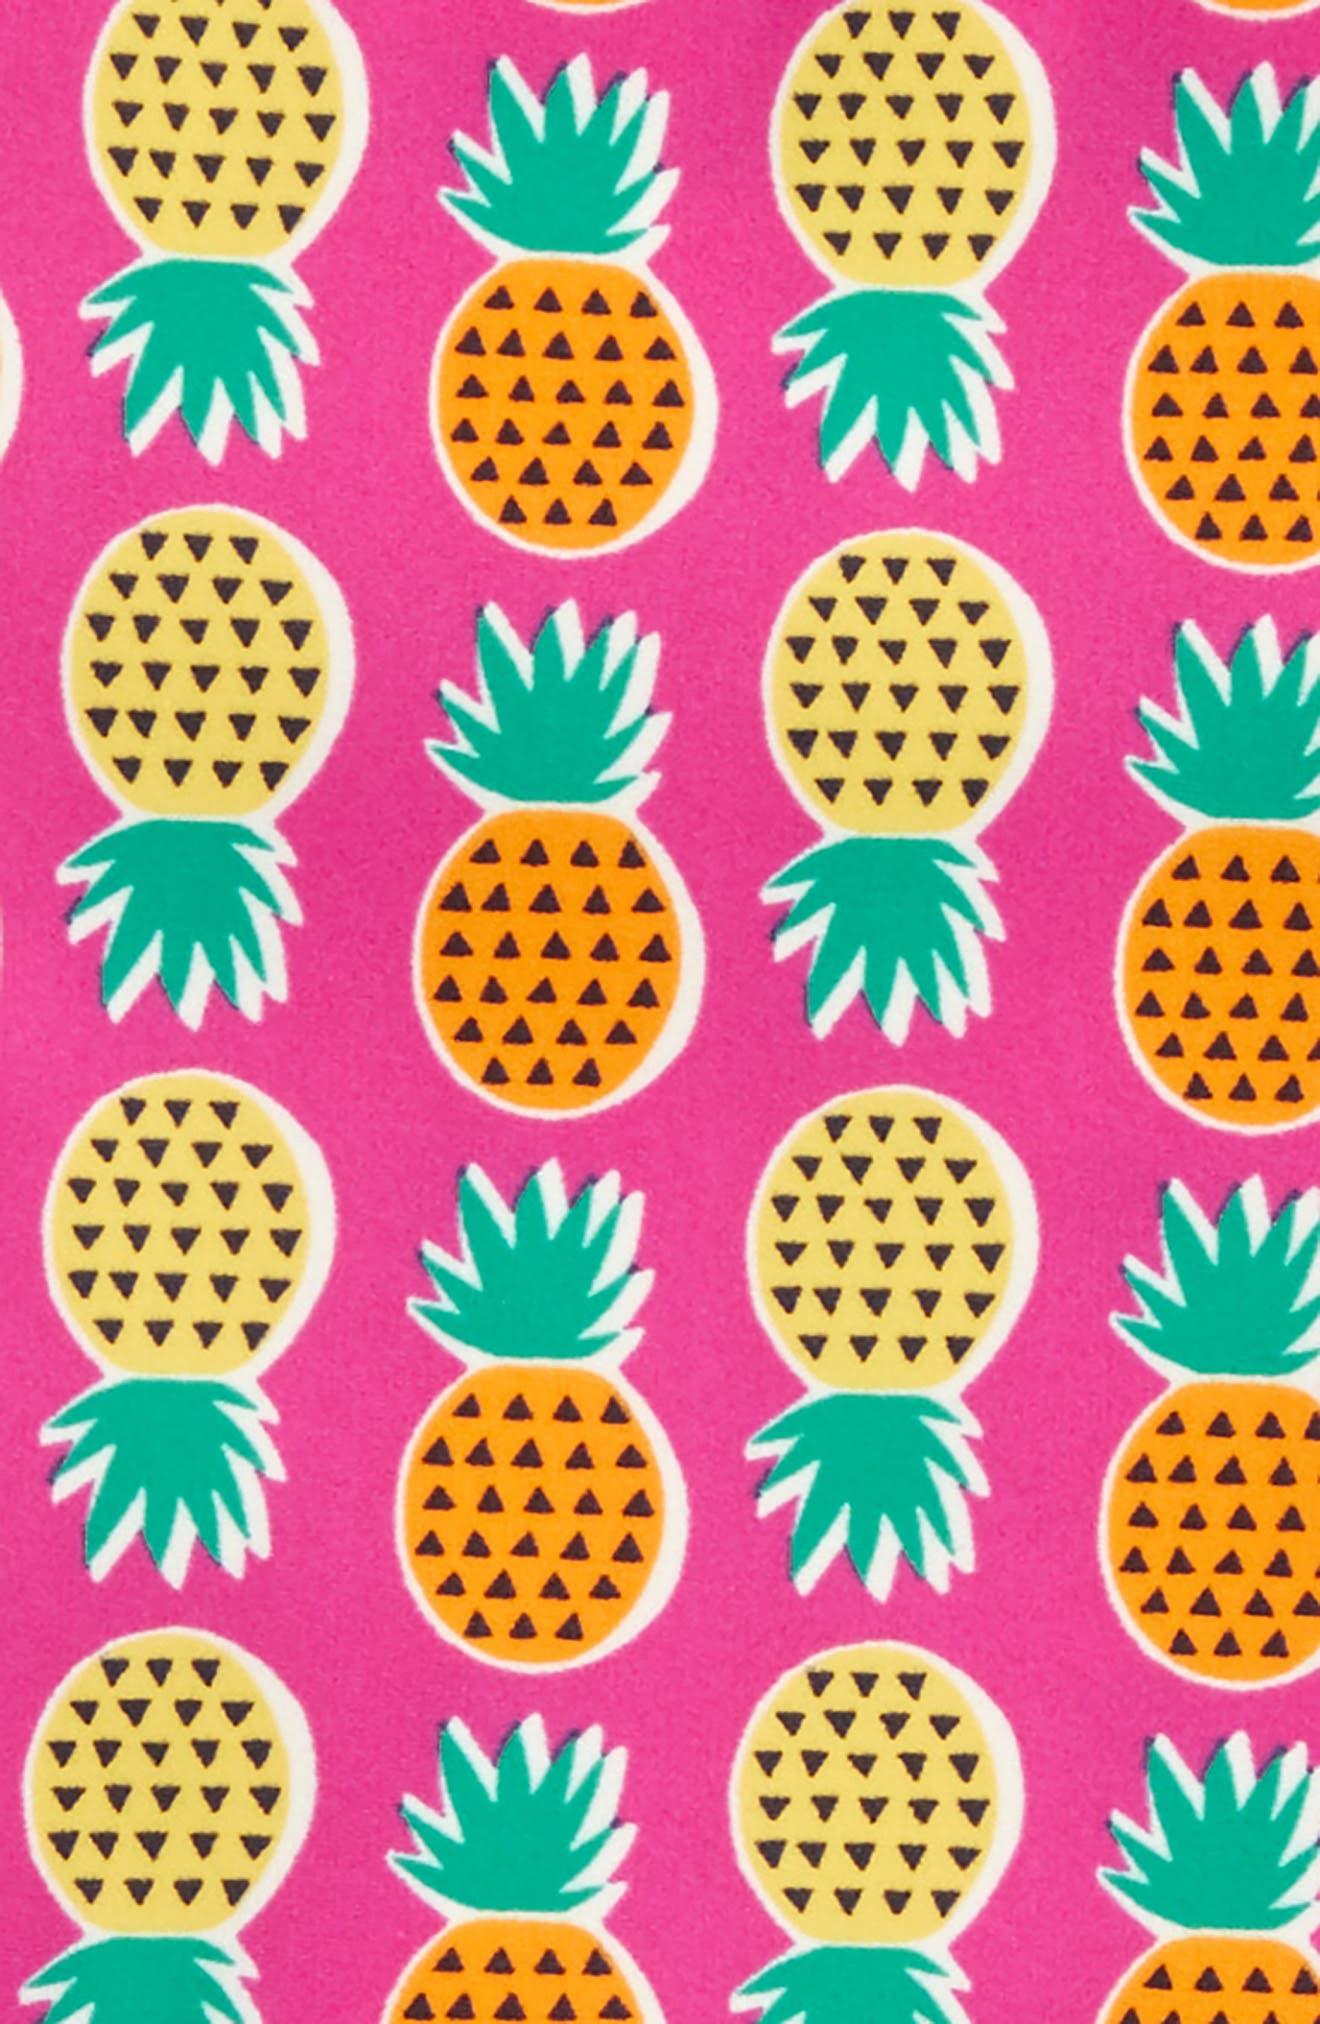 Mixed Print Two-Piece Rashguard Swimsuit,                             Alternate thumbnail 2, color,                             Tropical Pineapples